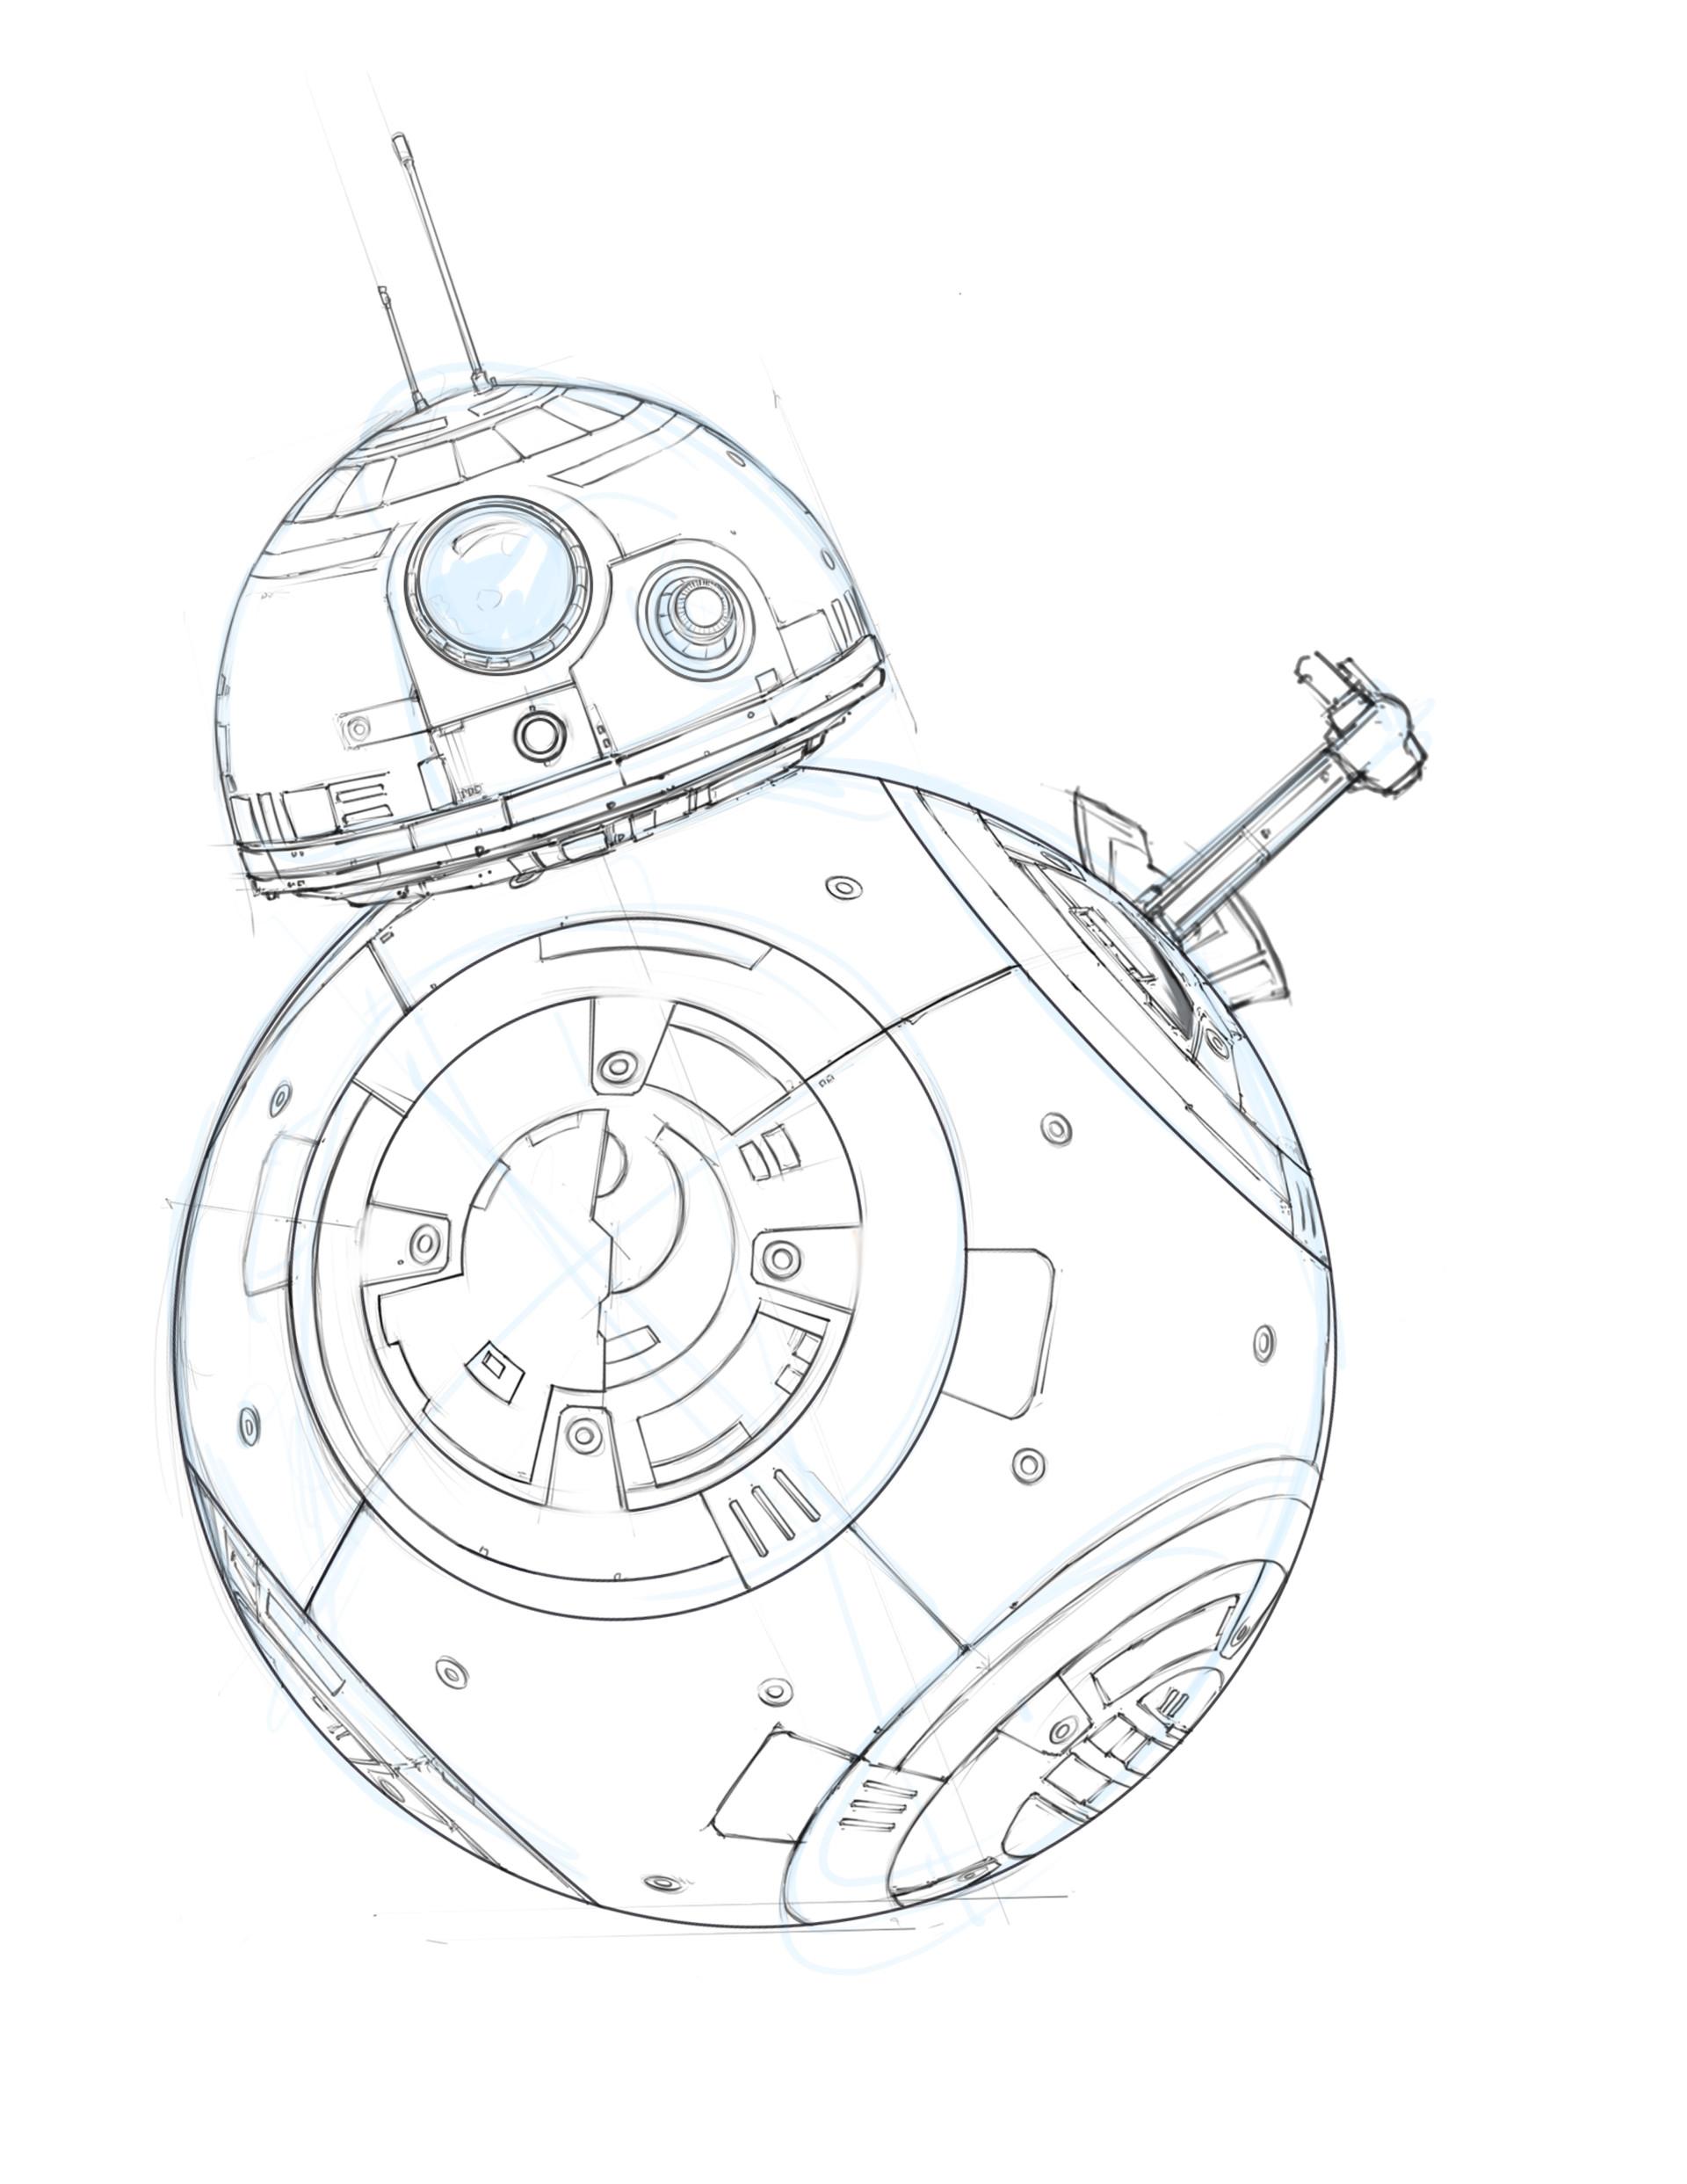 BB-8 Droid Sketch